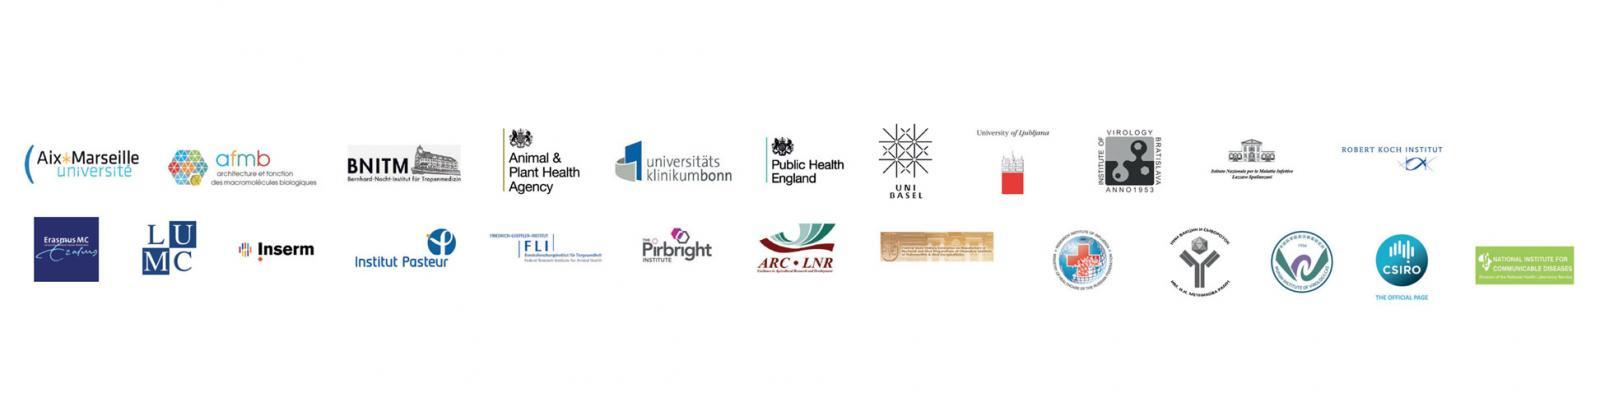 EVAg partner logos